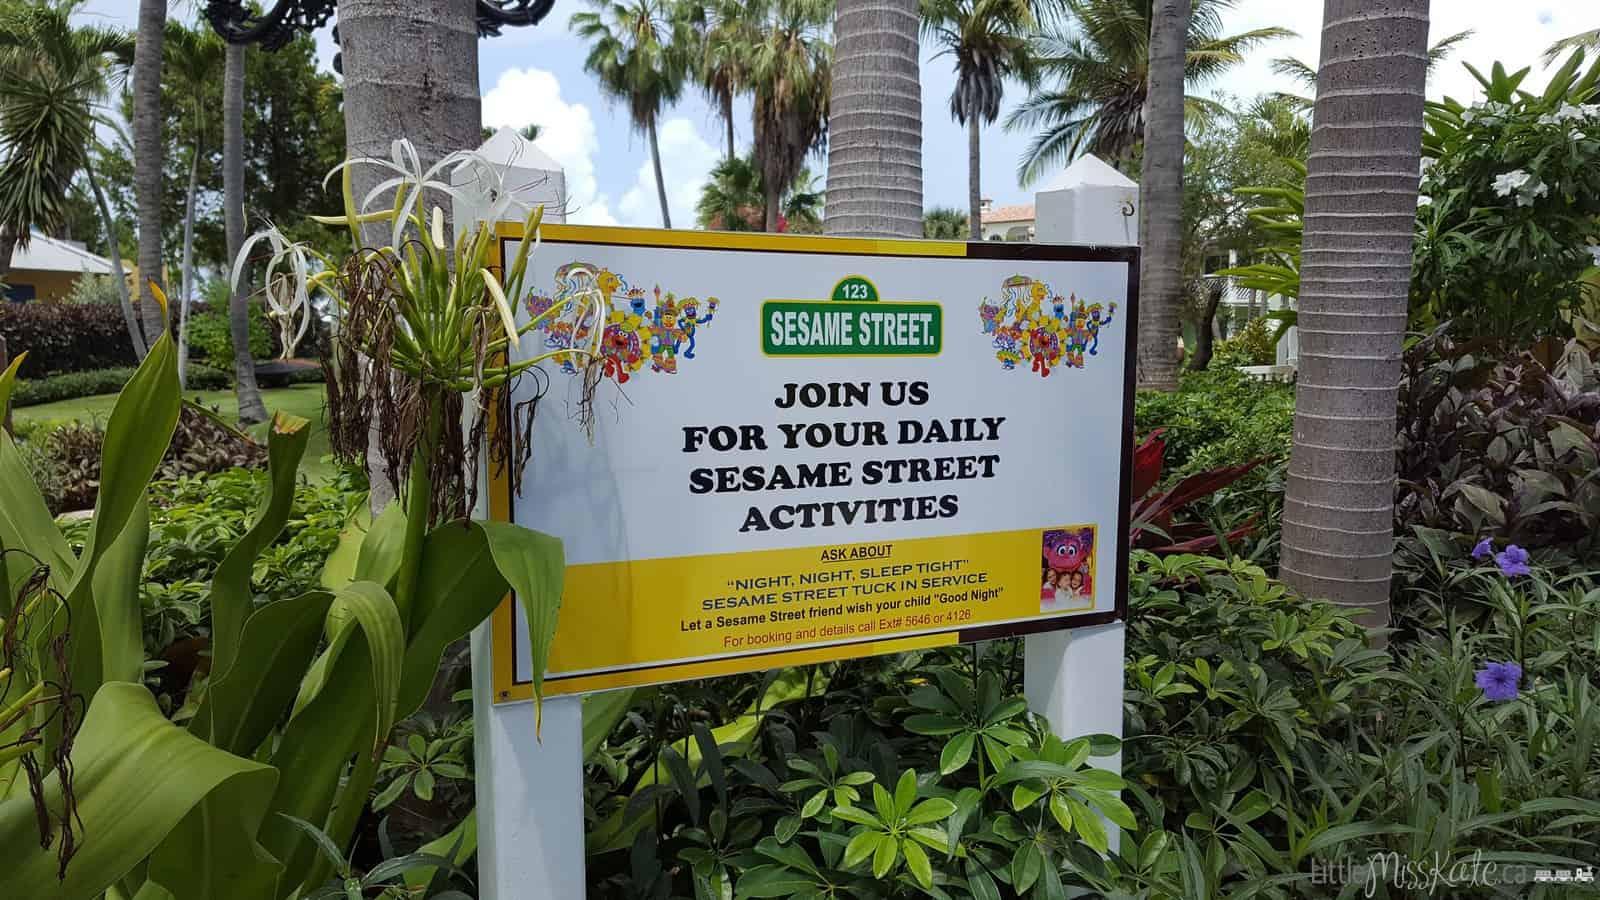 Beaches Resort Turks and Caicos Kid Camps via www.littlemisskate.ca